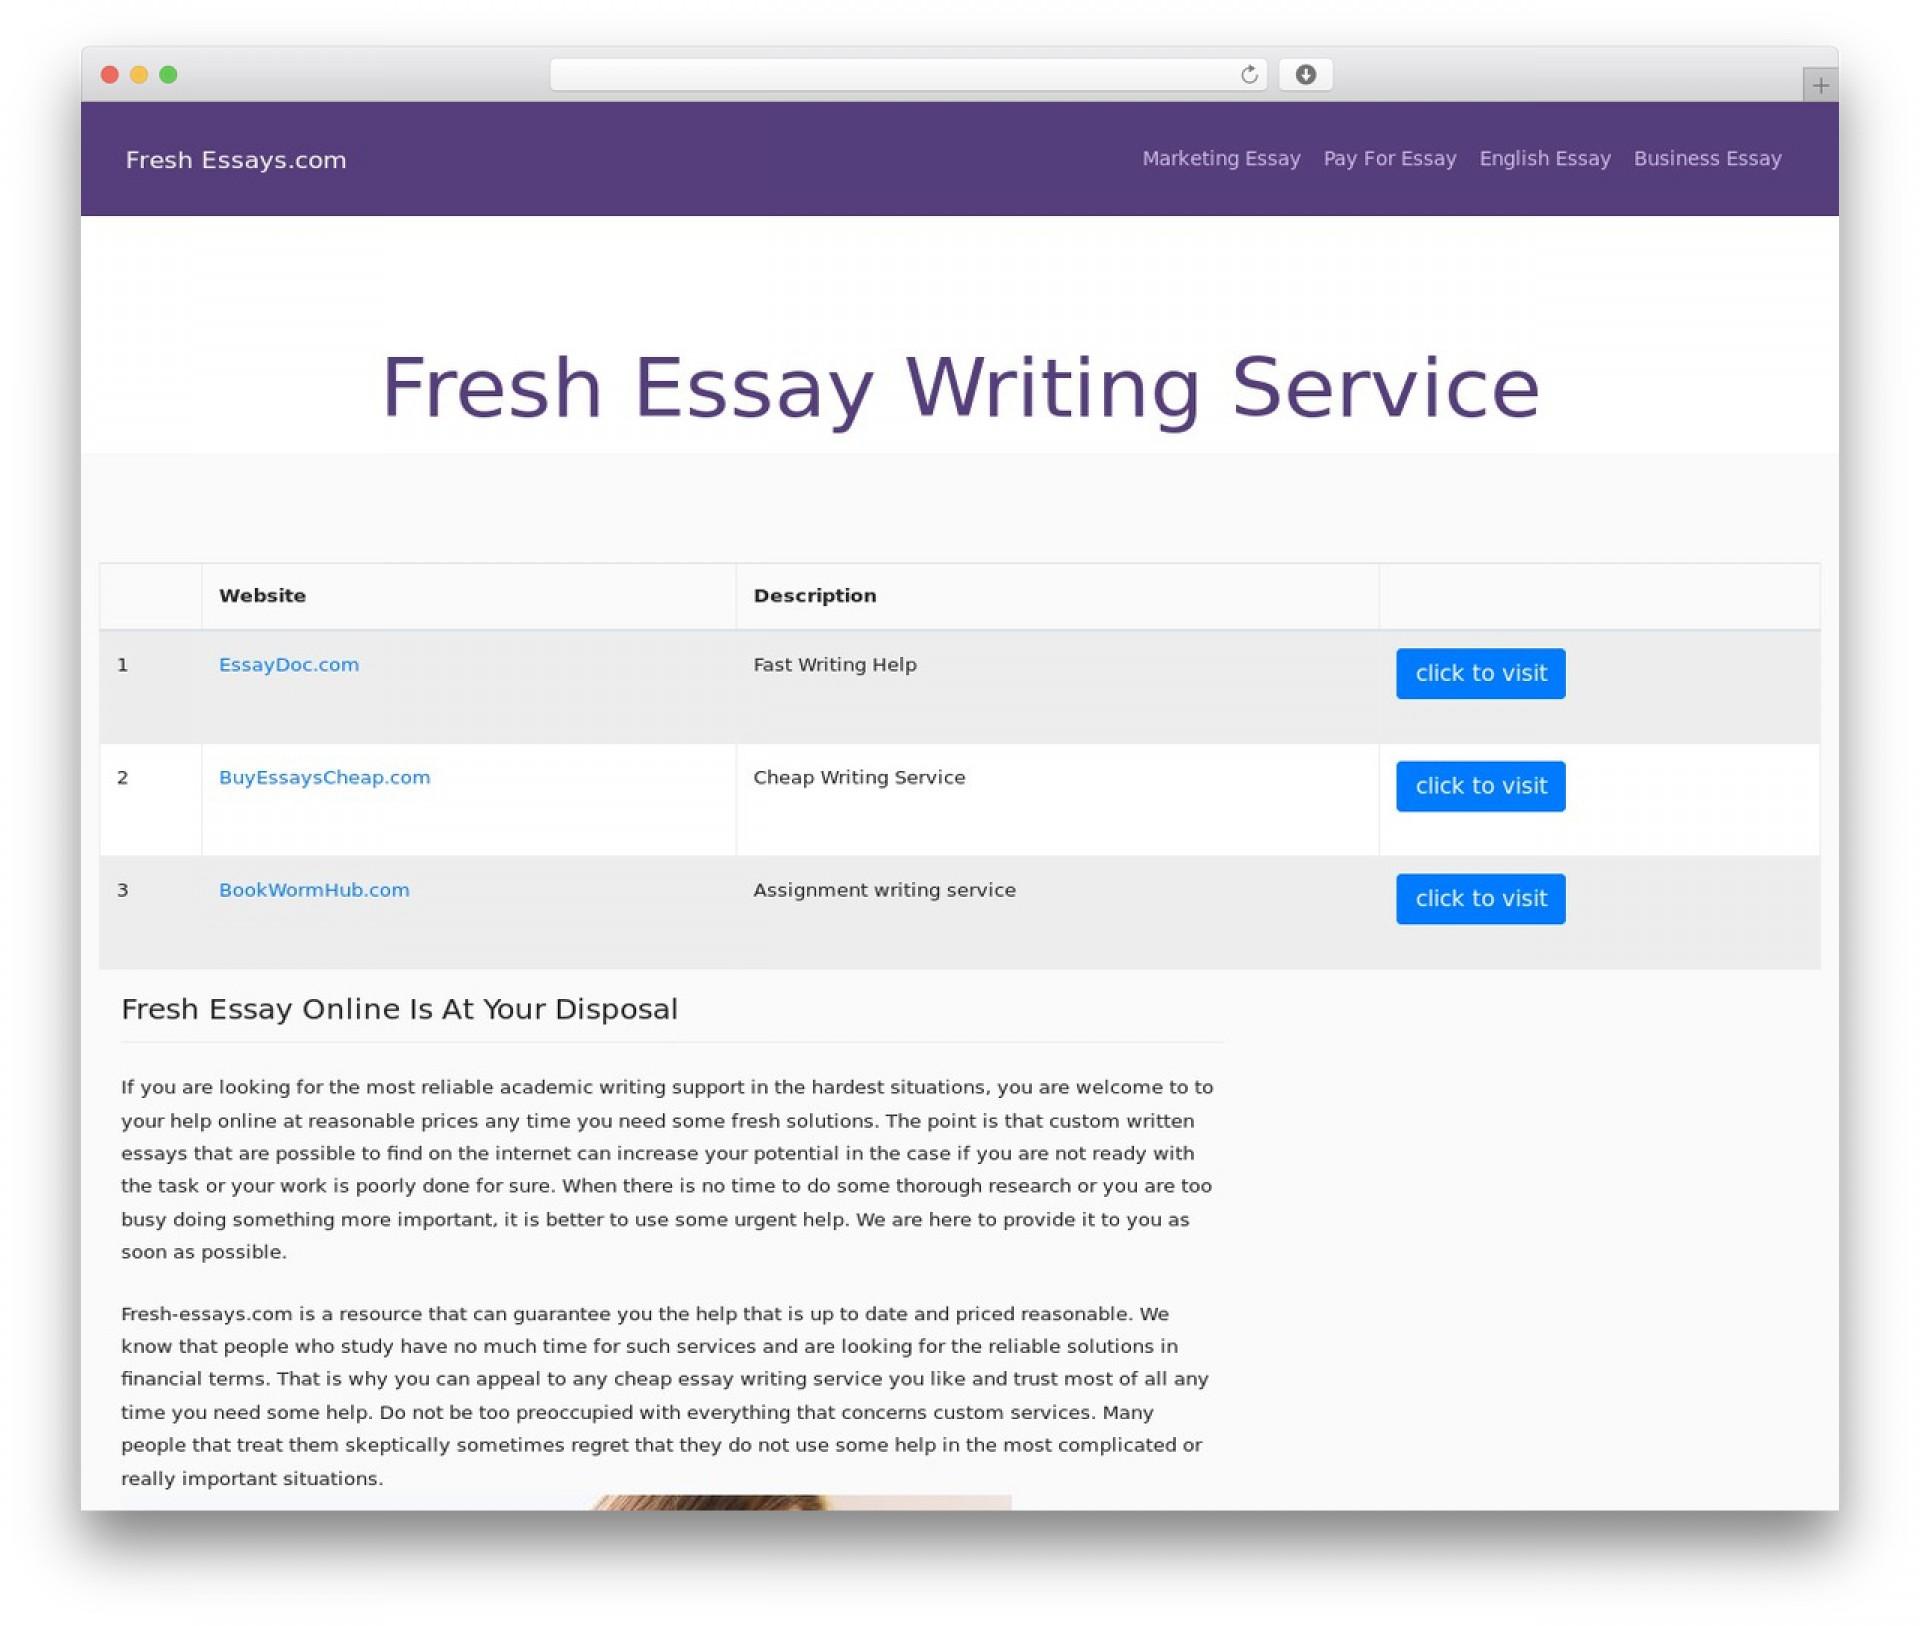 010 Material Design Wp Best Free Wordpress Theme 7cr4 O Fresh Essays Essay Wondrous Contact Customer Service Number 1920